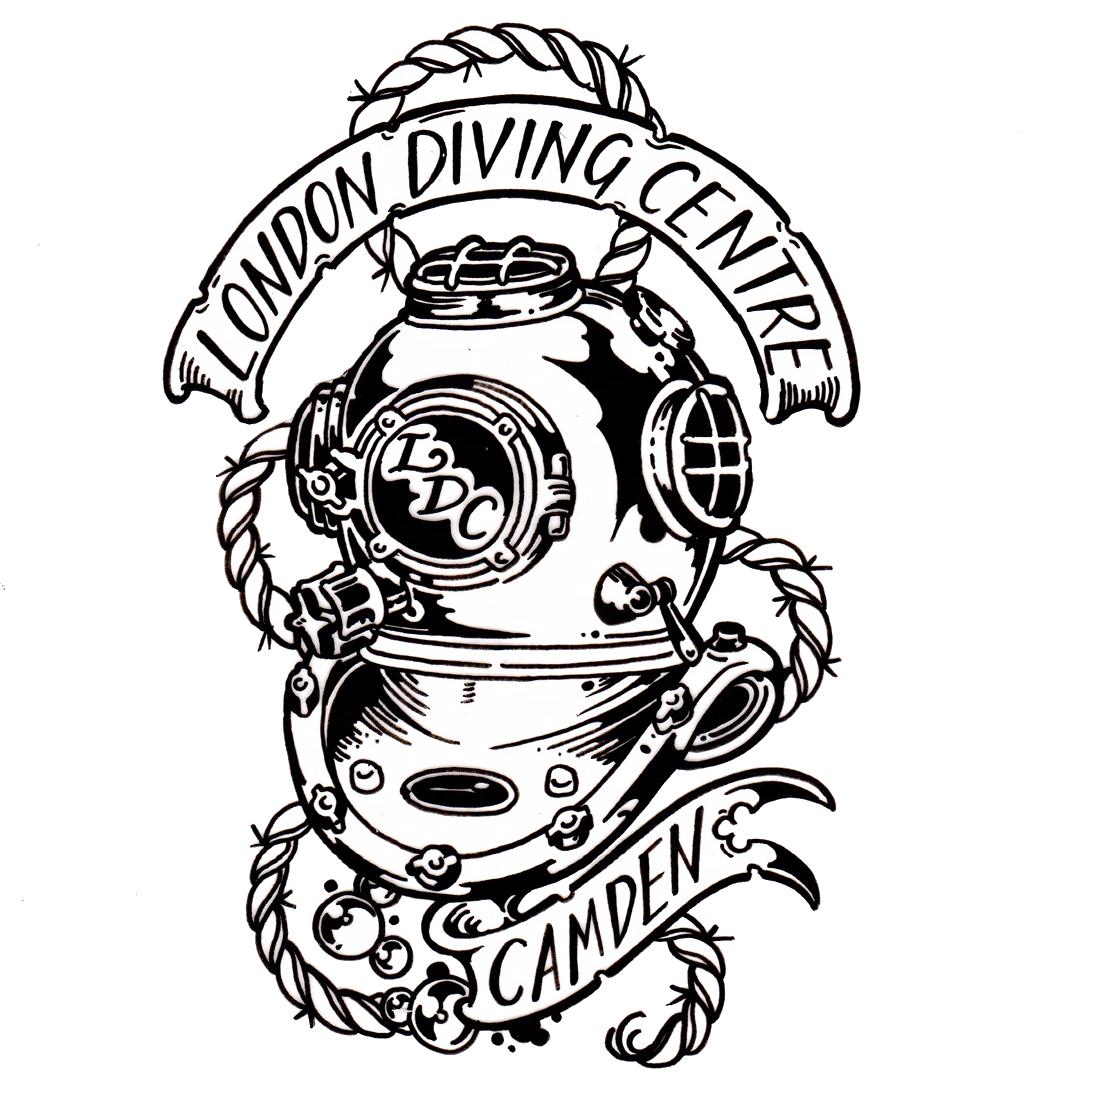 London centre camden personal. Diver clipart springboard diving